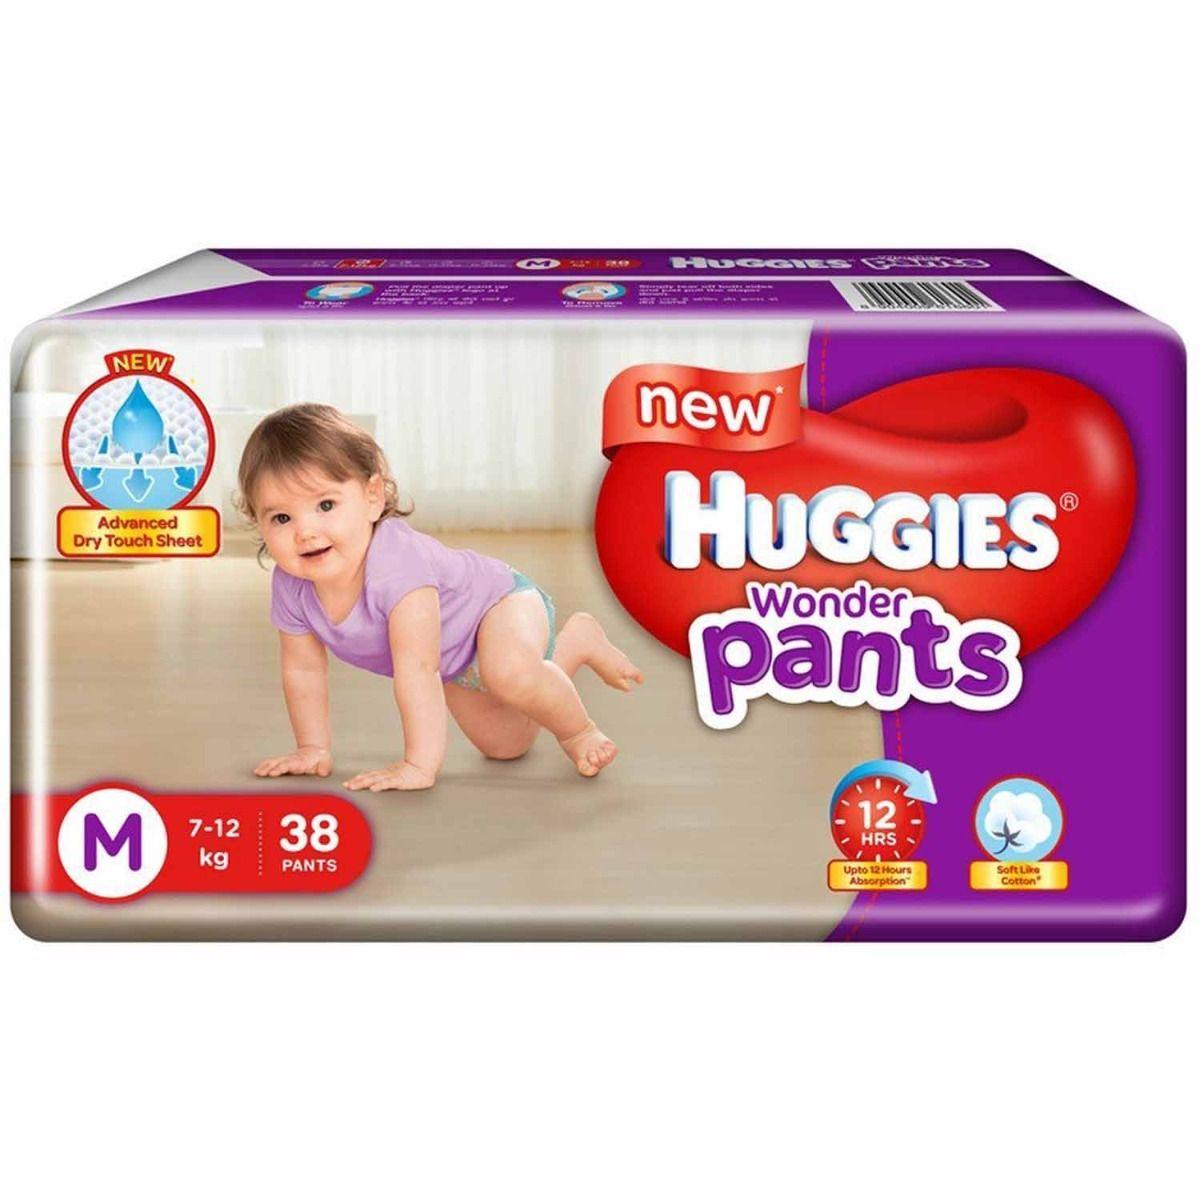 Huggies Wonder Pants Medium, 38 Count